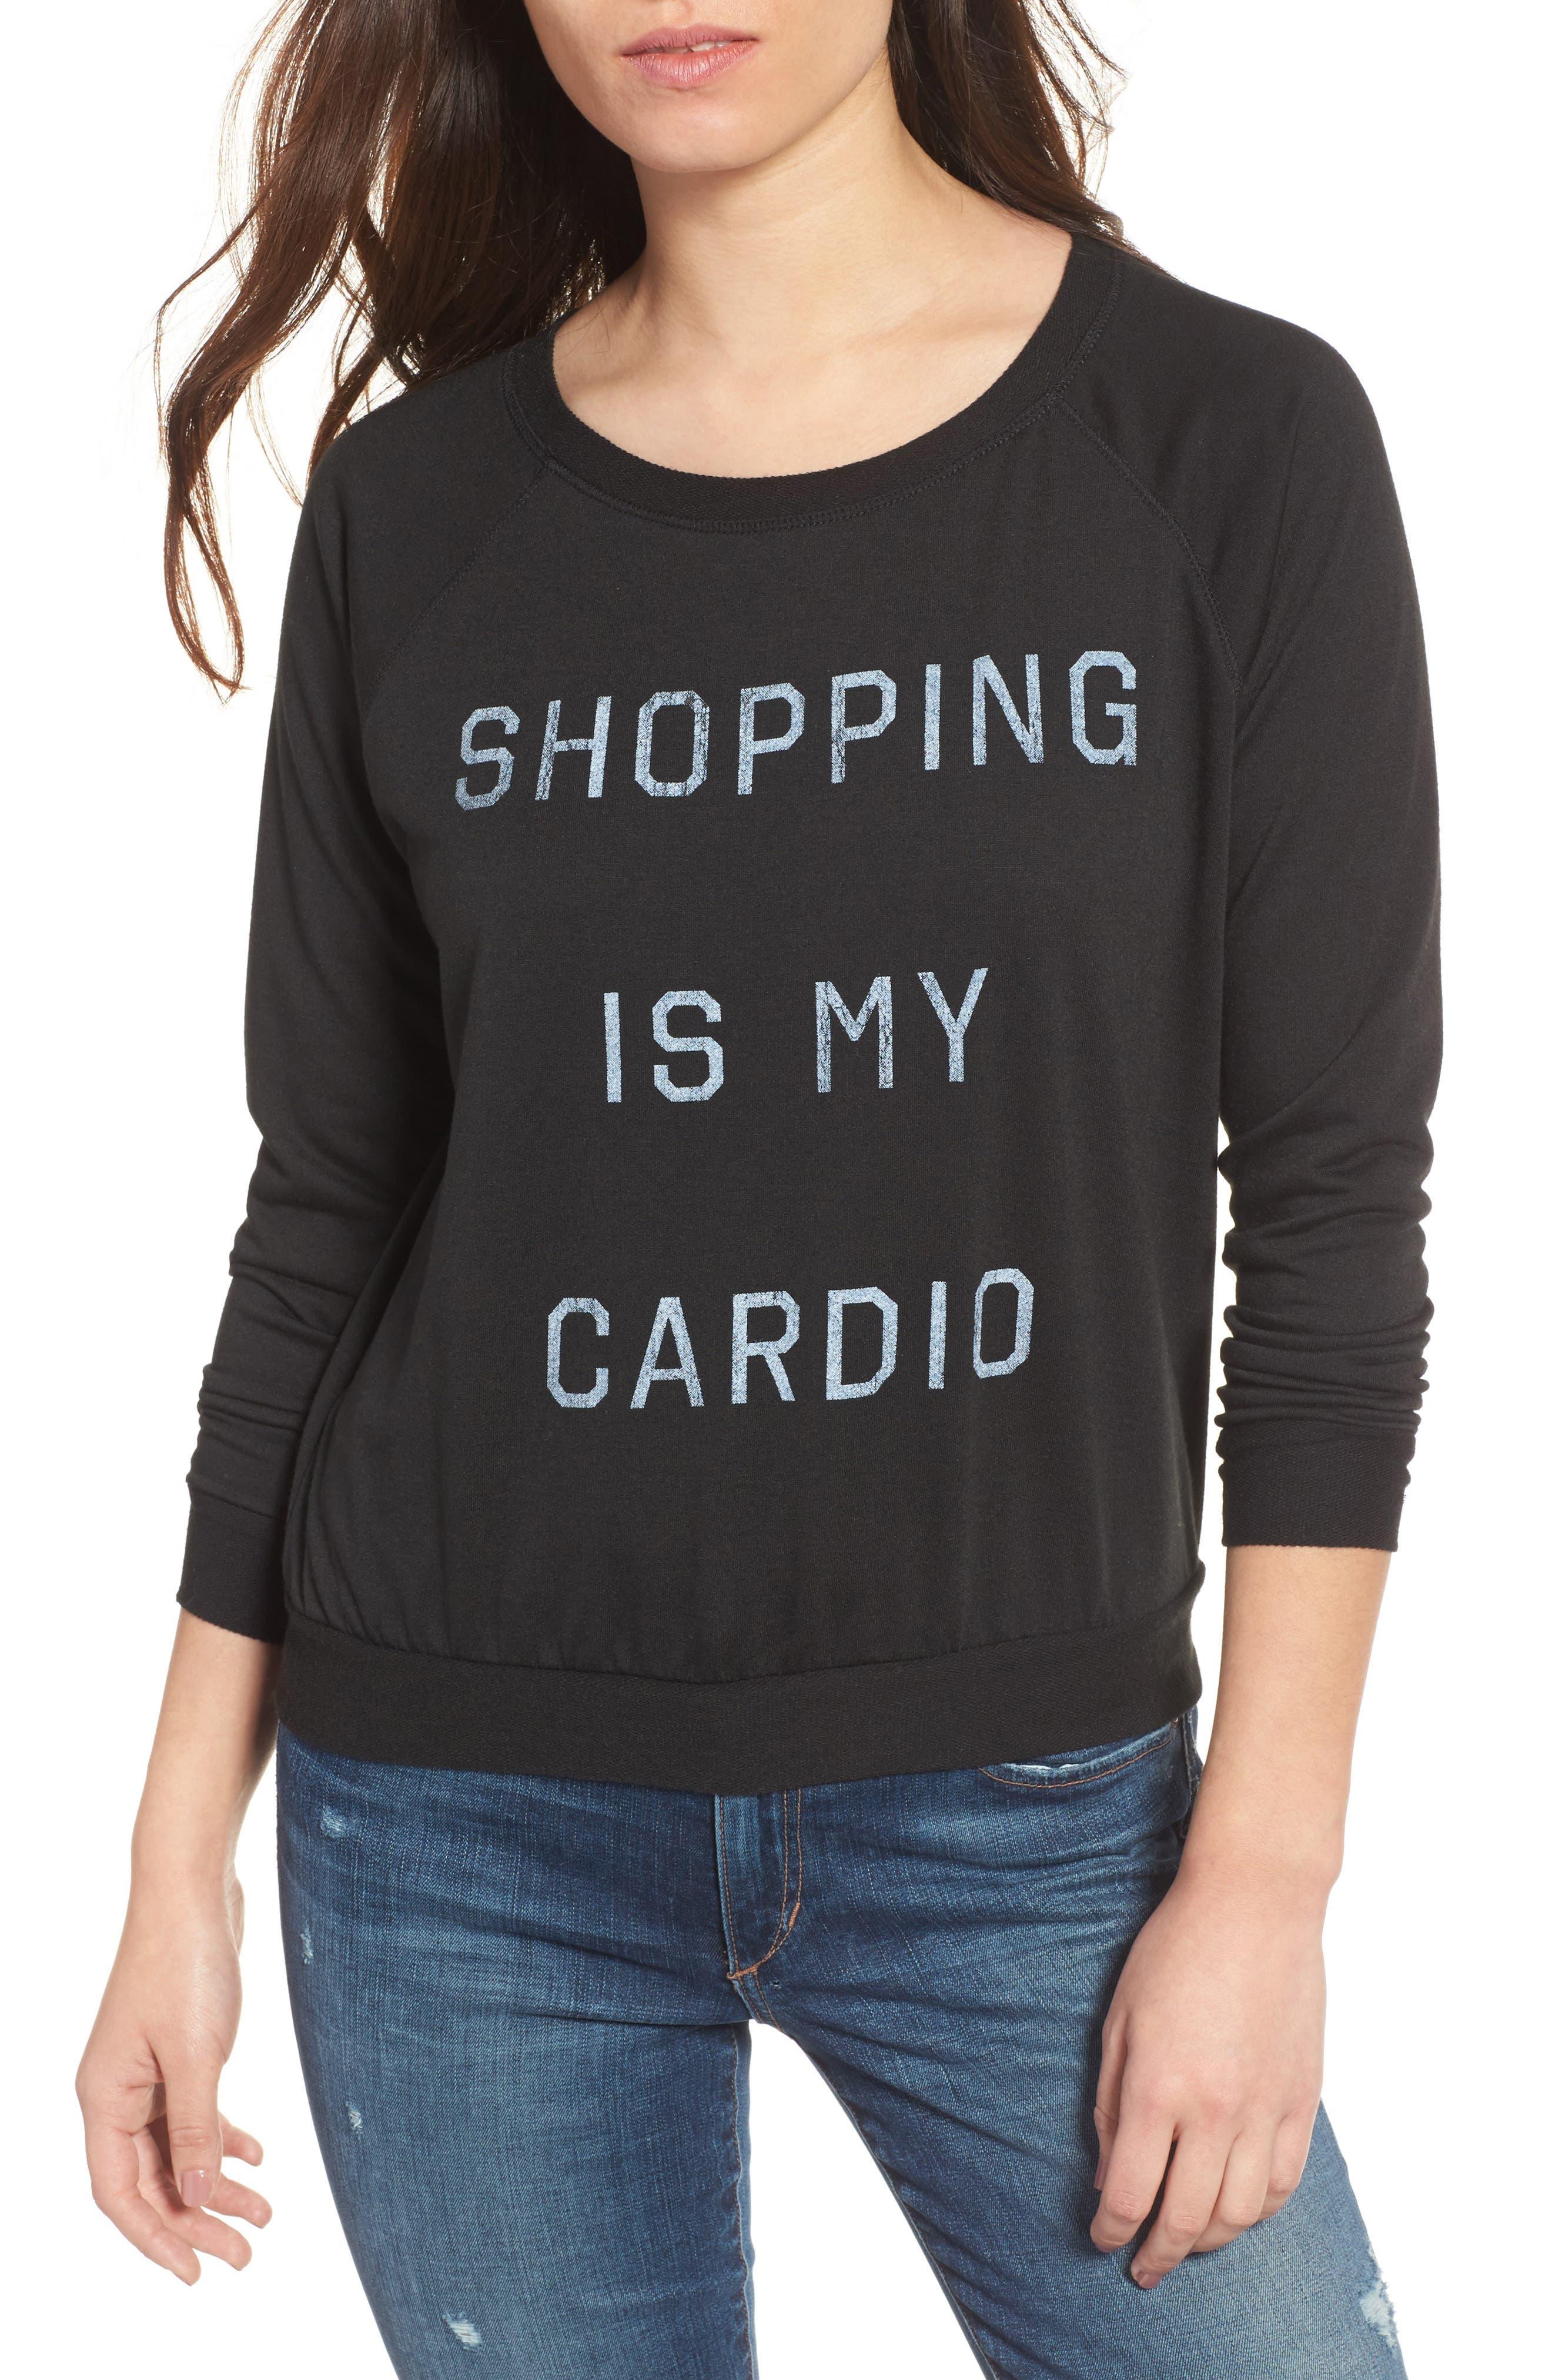 Shopping is My Cardio Tee,                             Main thumbnail 1, color,                             001